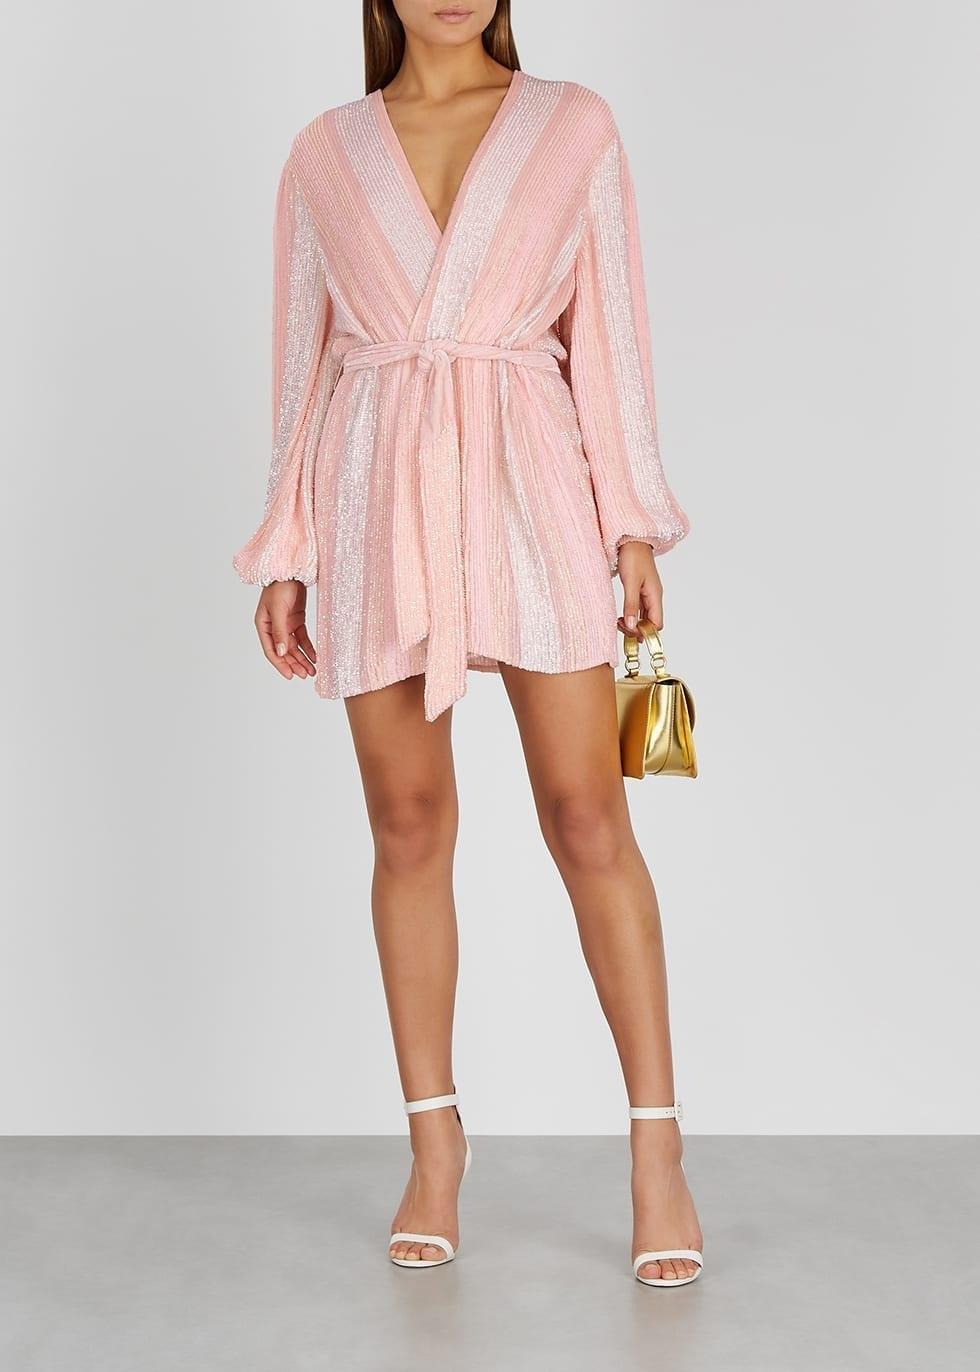 RETROFÊTE Gabrielle Pink Striped Sequin Mini Dress